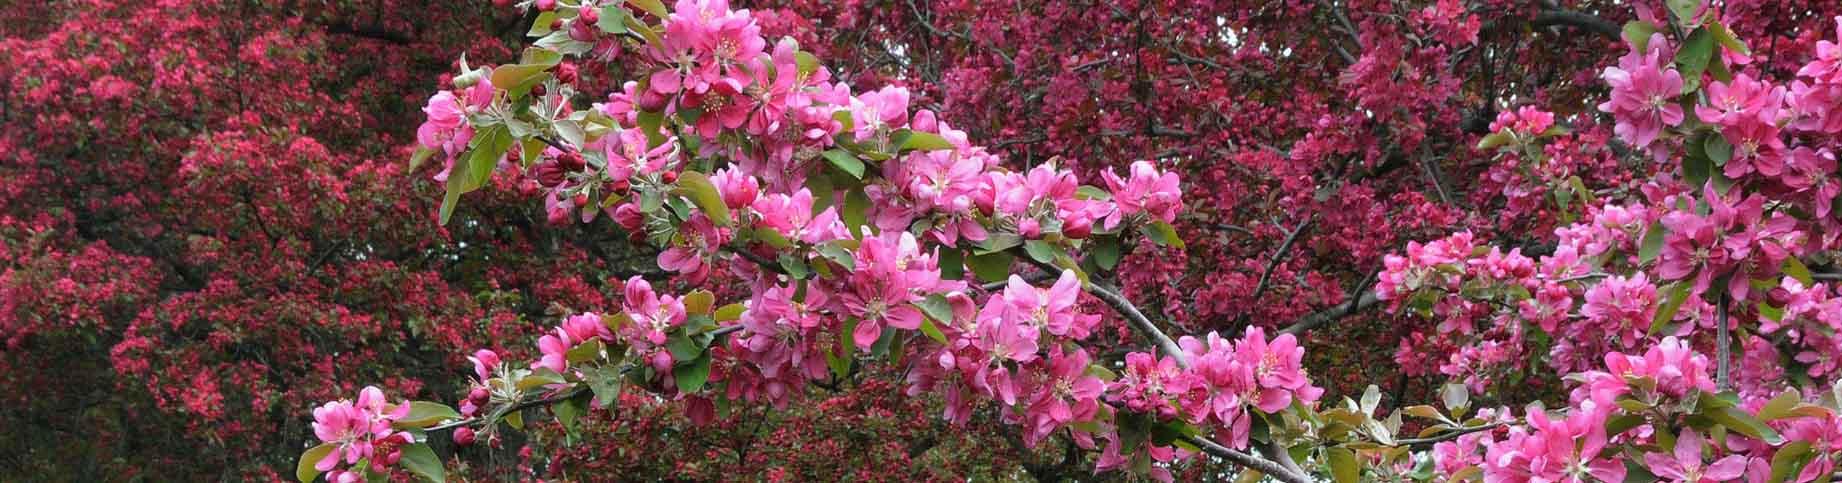 Rosybloom Crabapple blossom